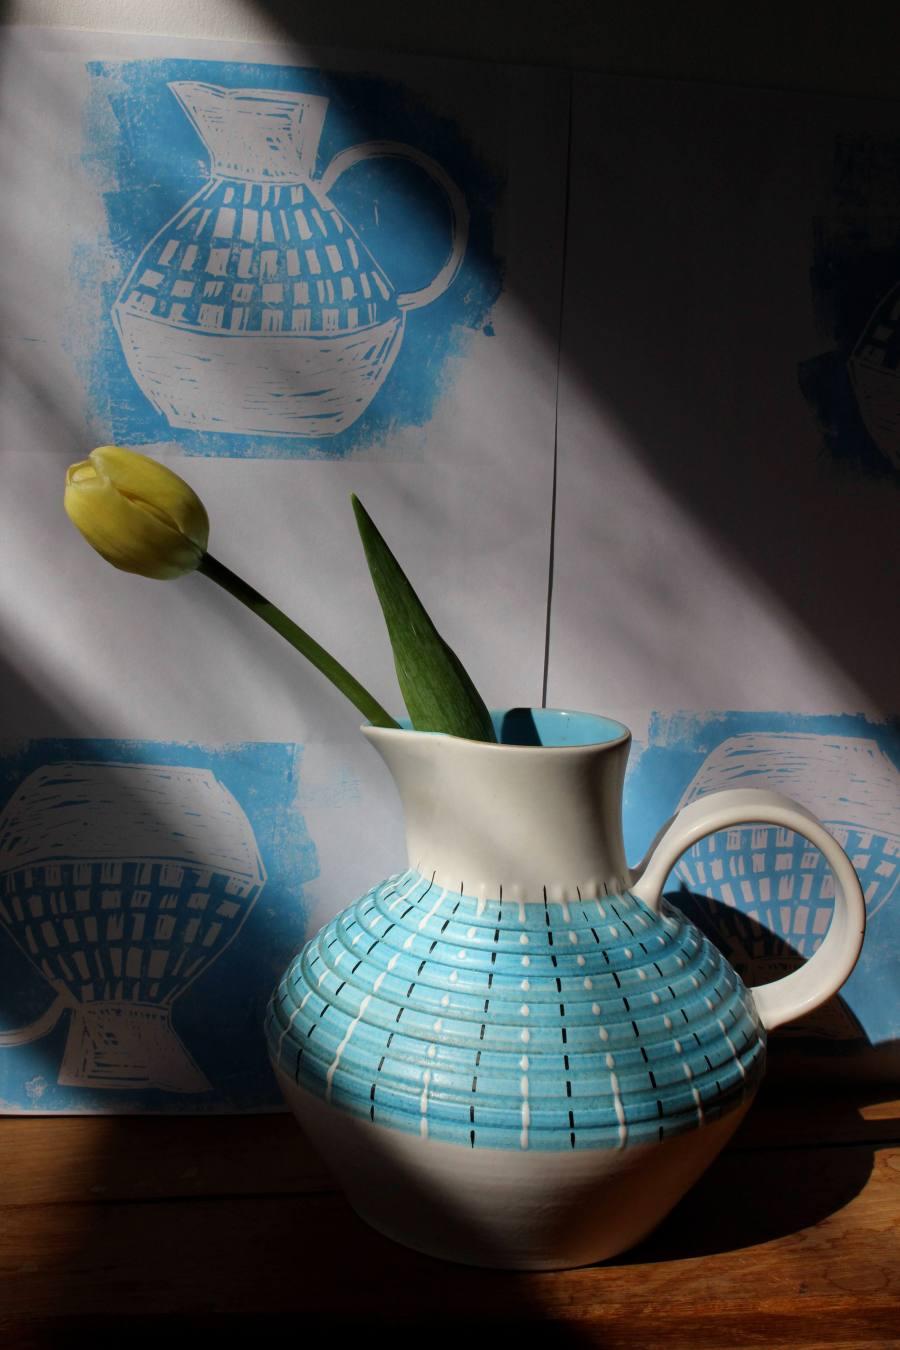 Denby jug and linocuts